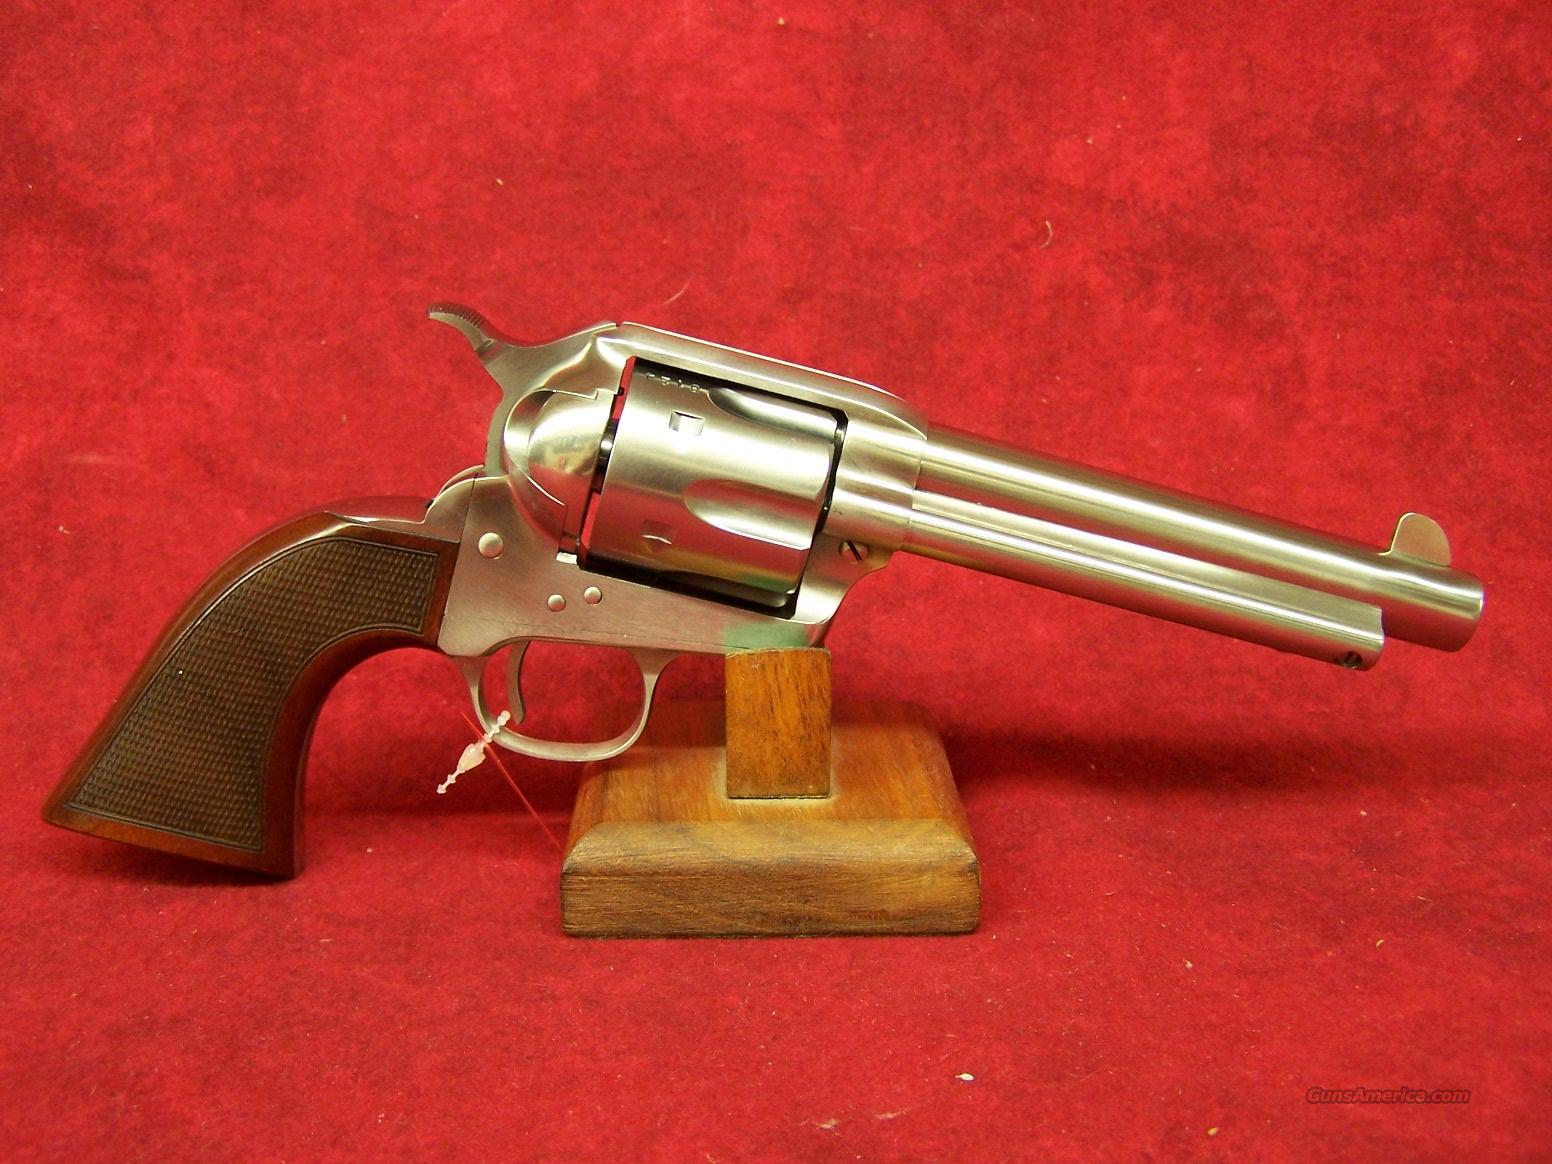 "Uberti 1873 Cattleman El Patron Competition .45LC 5 1/2"" Stainless Steel (345083)  Guns > Pistols > Uberti Pistols > Ctg."